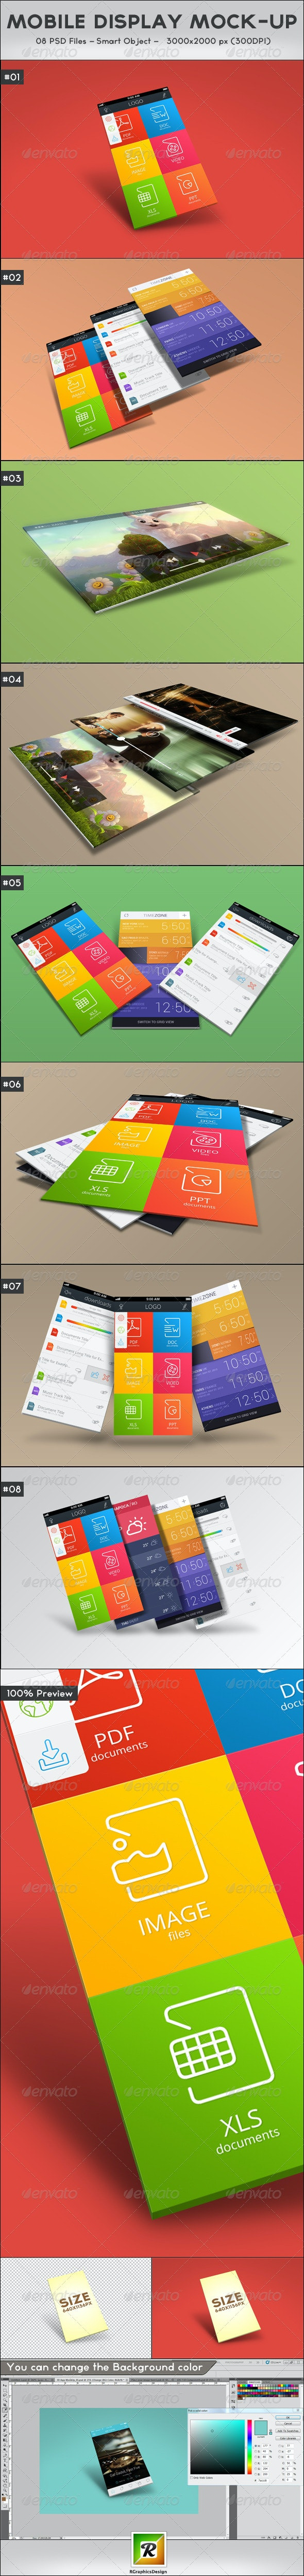 Mobile Display Mock-Up - Mobile Displays